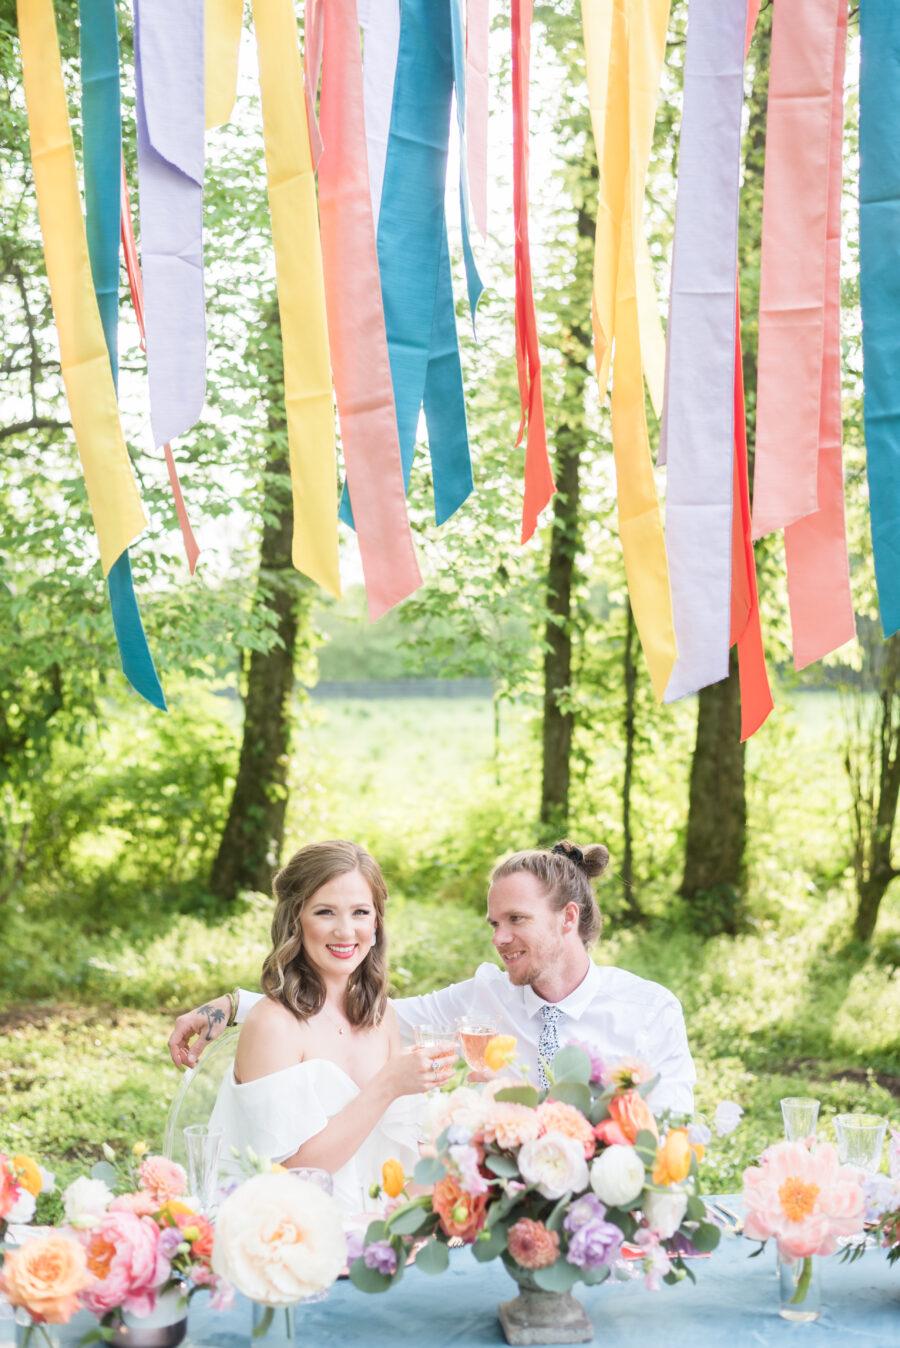 Colorful hanging wedding table decor